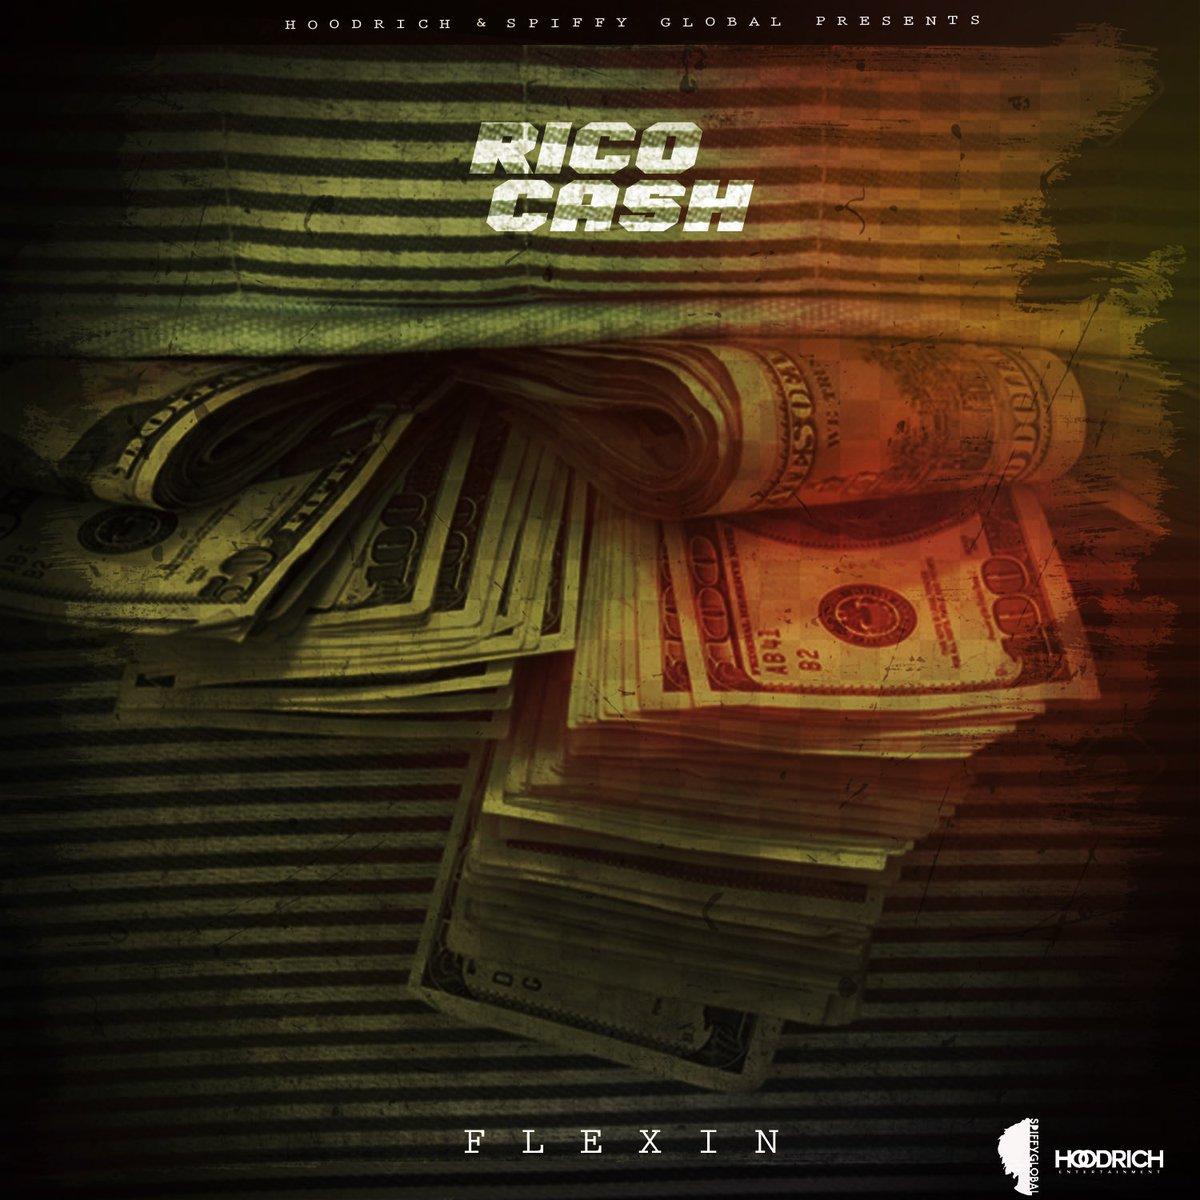 Follow my fuckin bro @YungRicoCash #Flexing out now   https:// soundcloud.com/umjust-spiffy/ spiffy-global-ft-rico-cash-flexing &nbsp; …  <br>http://pic.twitter.com/aNbQ6SDyp7